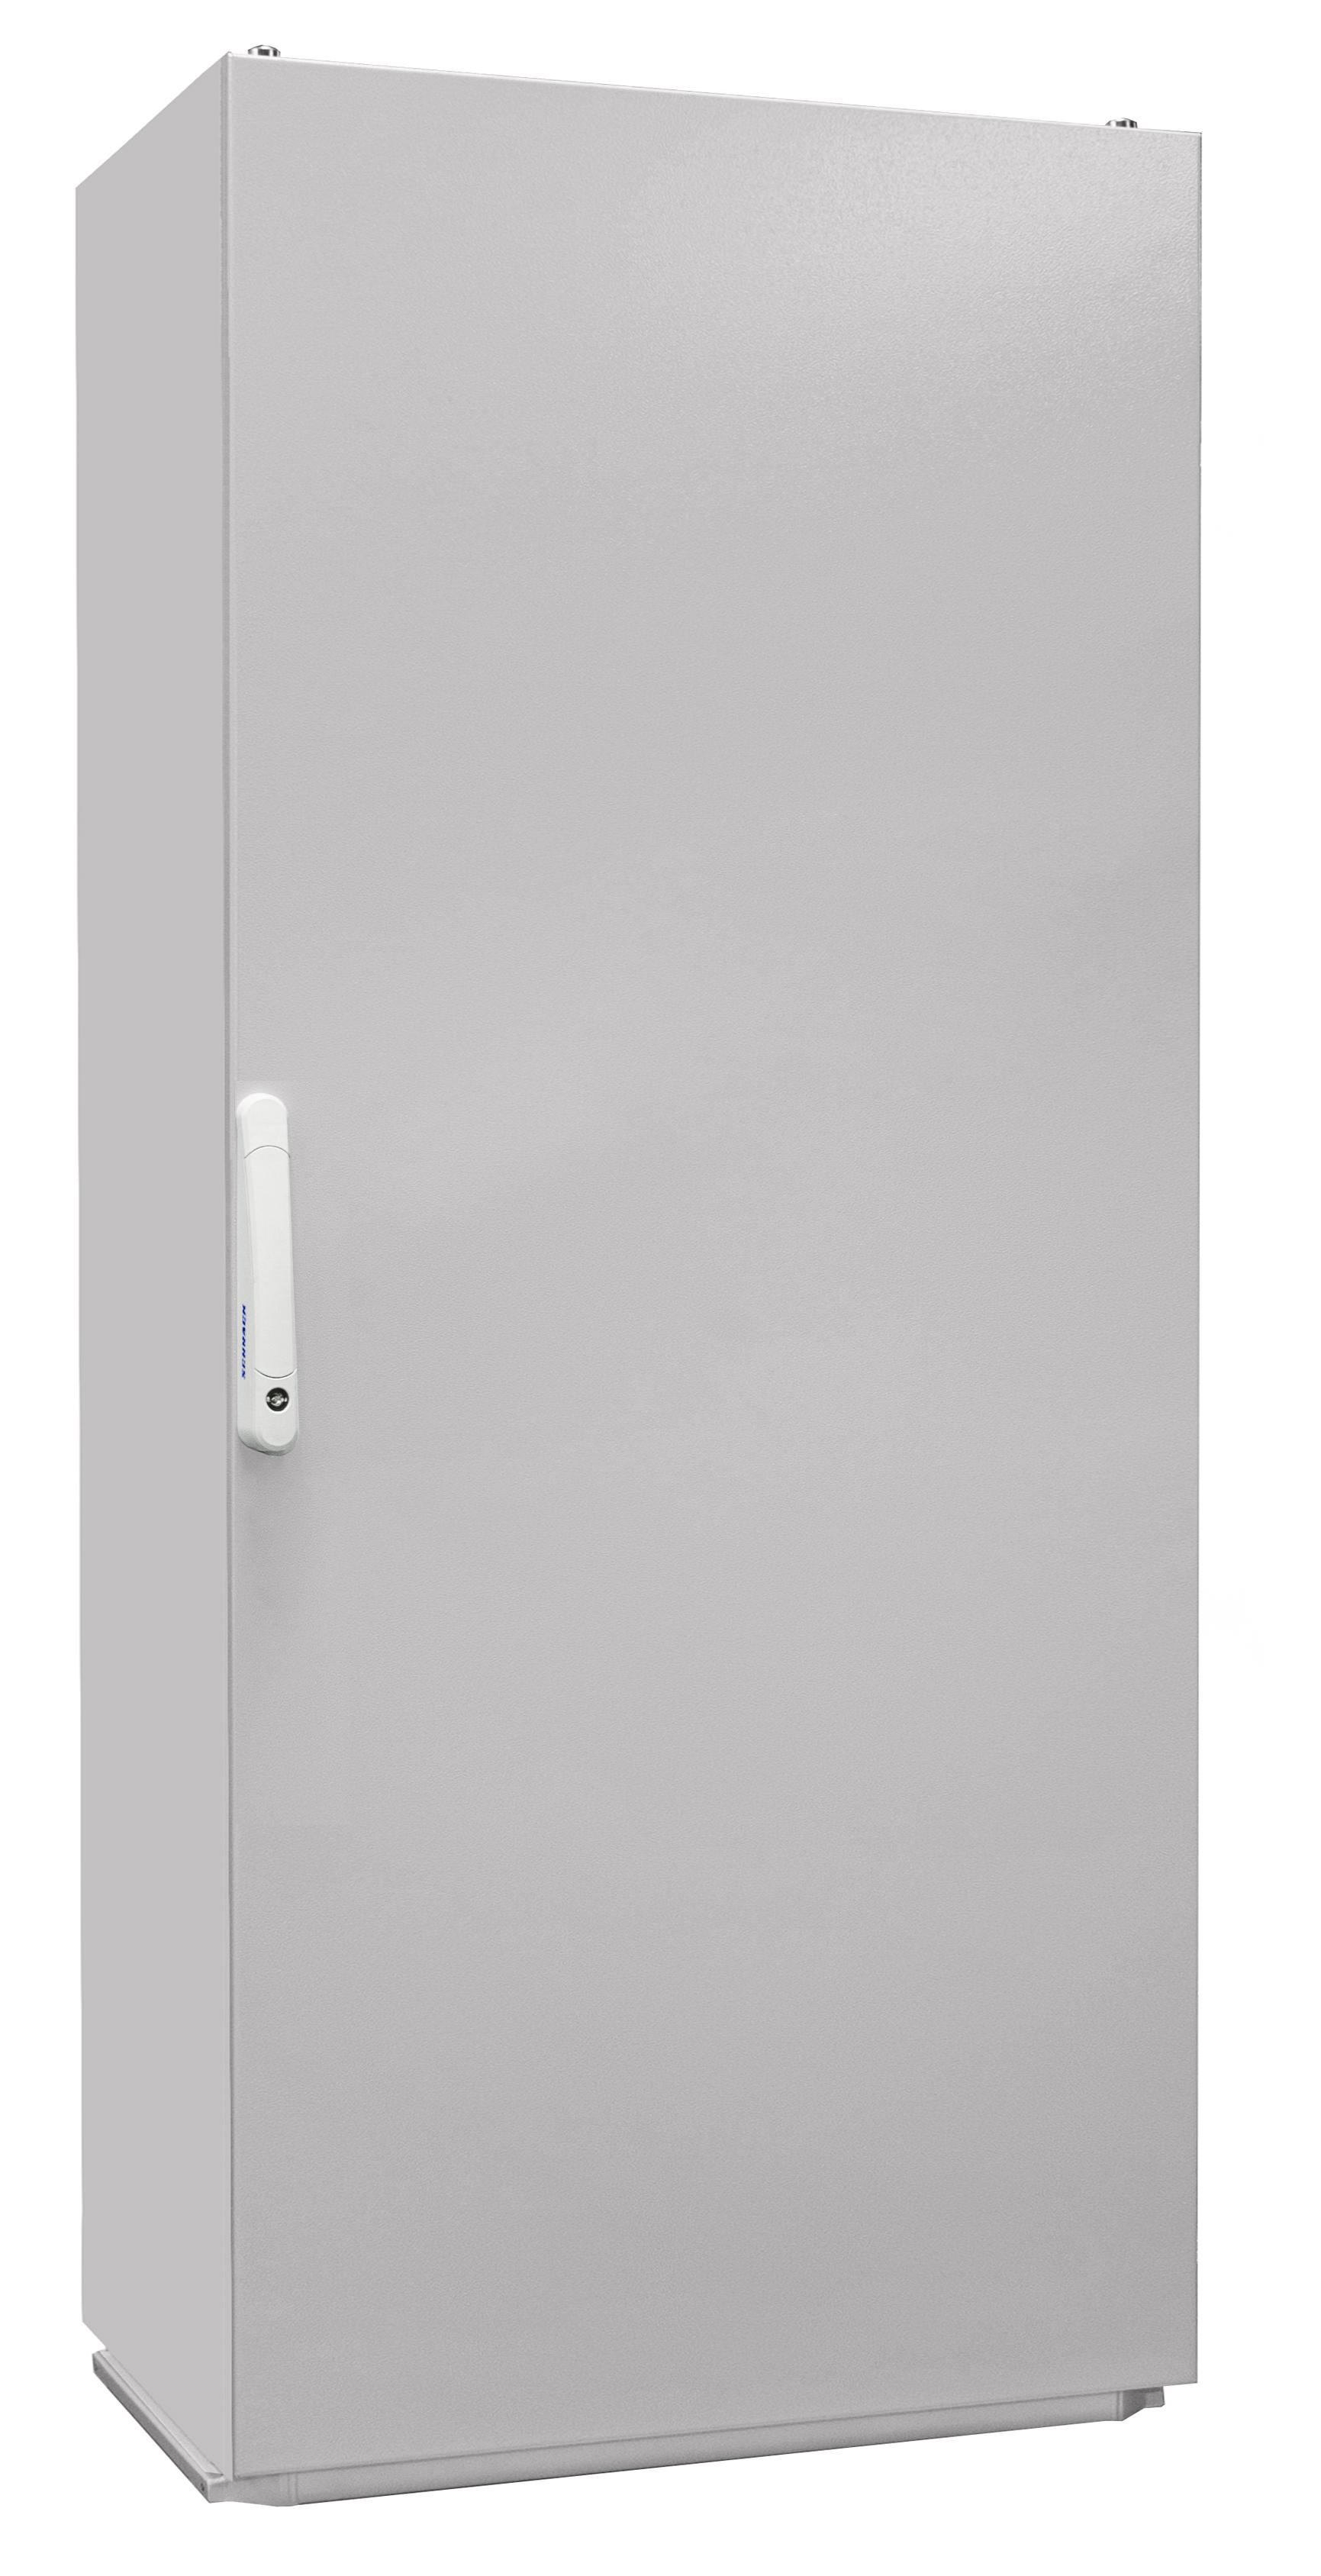 1 Stk Kompaktschrank 1-Tür IP55 H=1800 B=800 T=400mm Stahlblech KC188041--